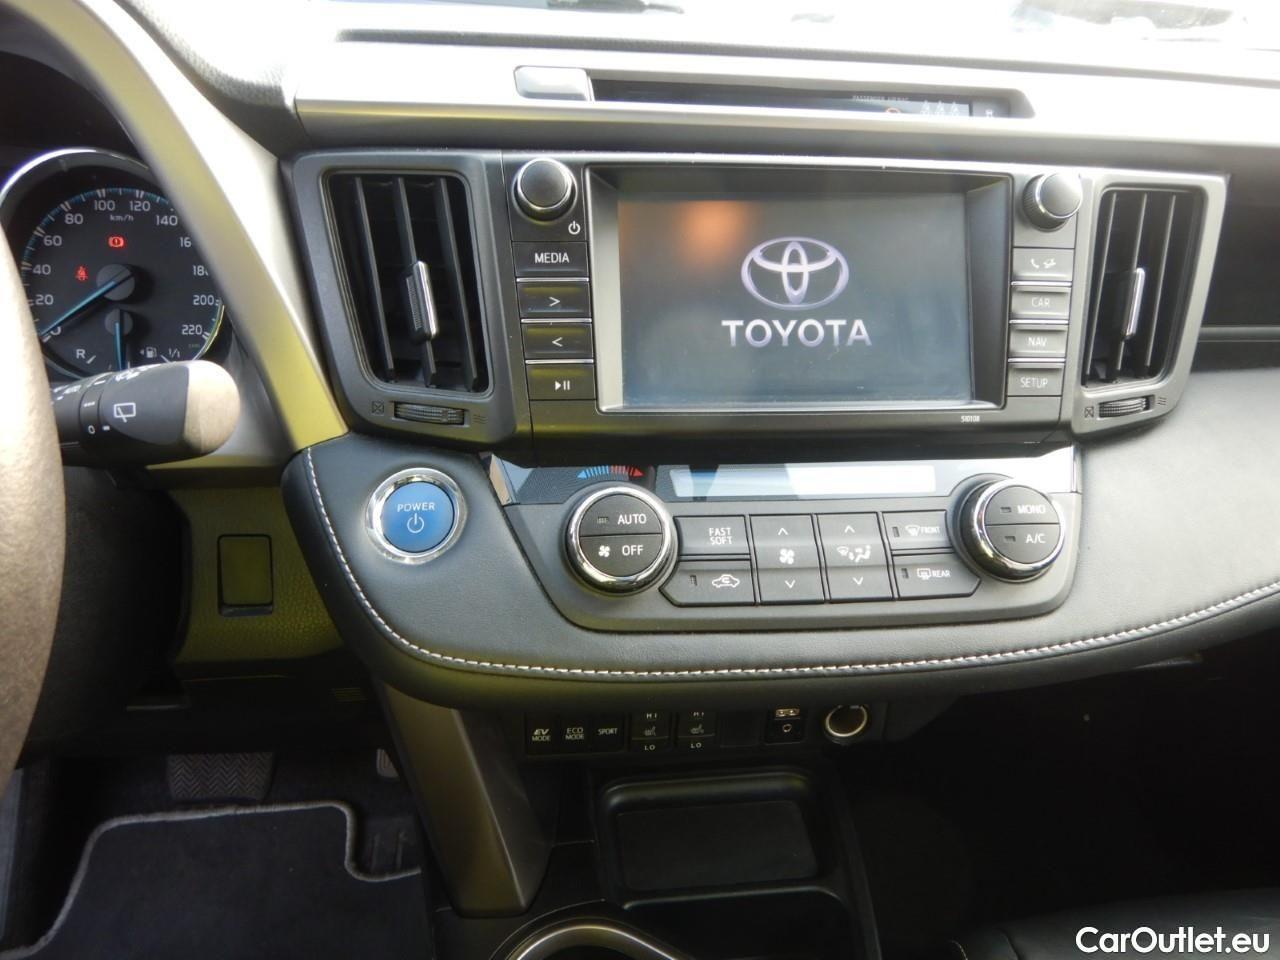 Toyota  RAV4 2.5 Hv 197cv Cvt Lounge 2wd #12